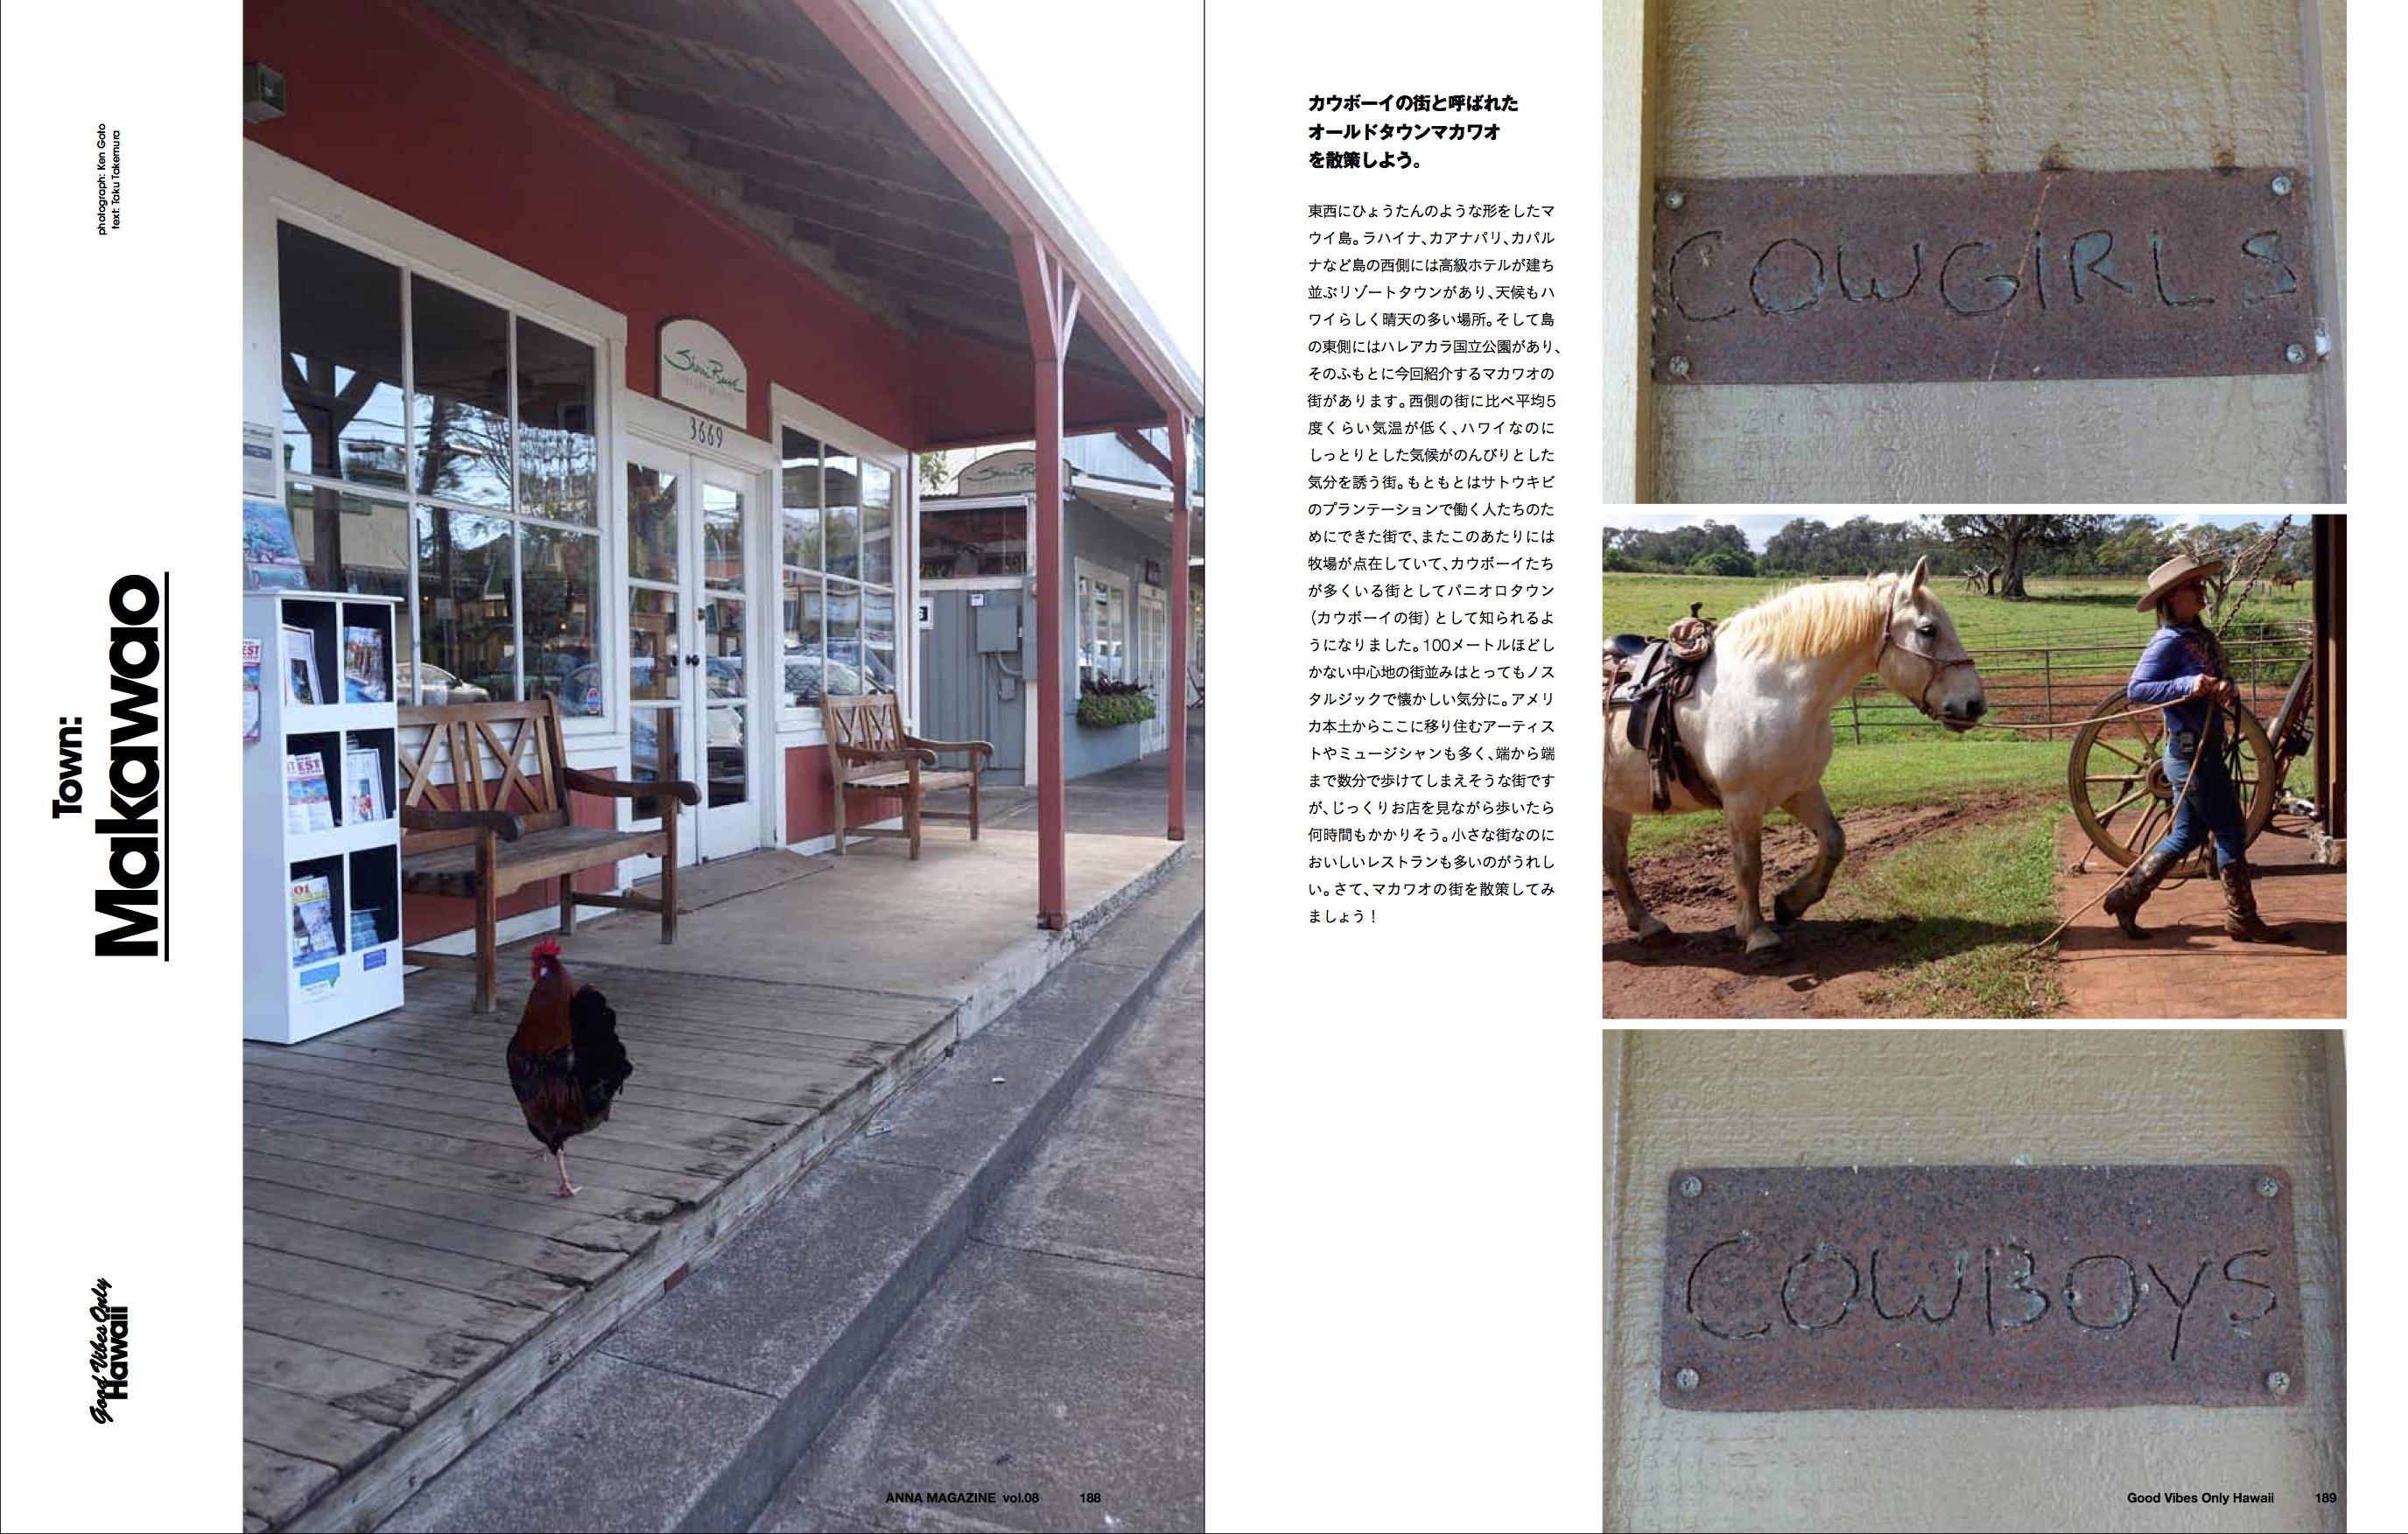 anna magazine vol.8 P95